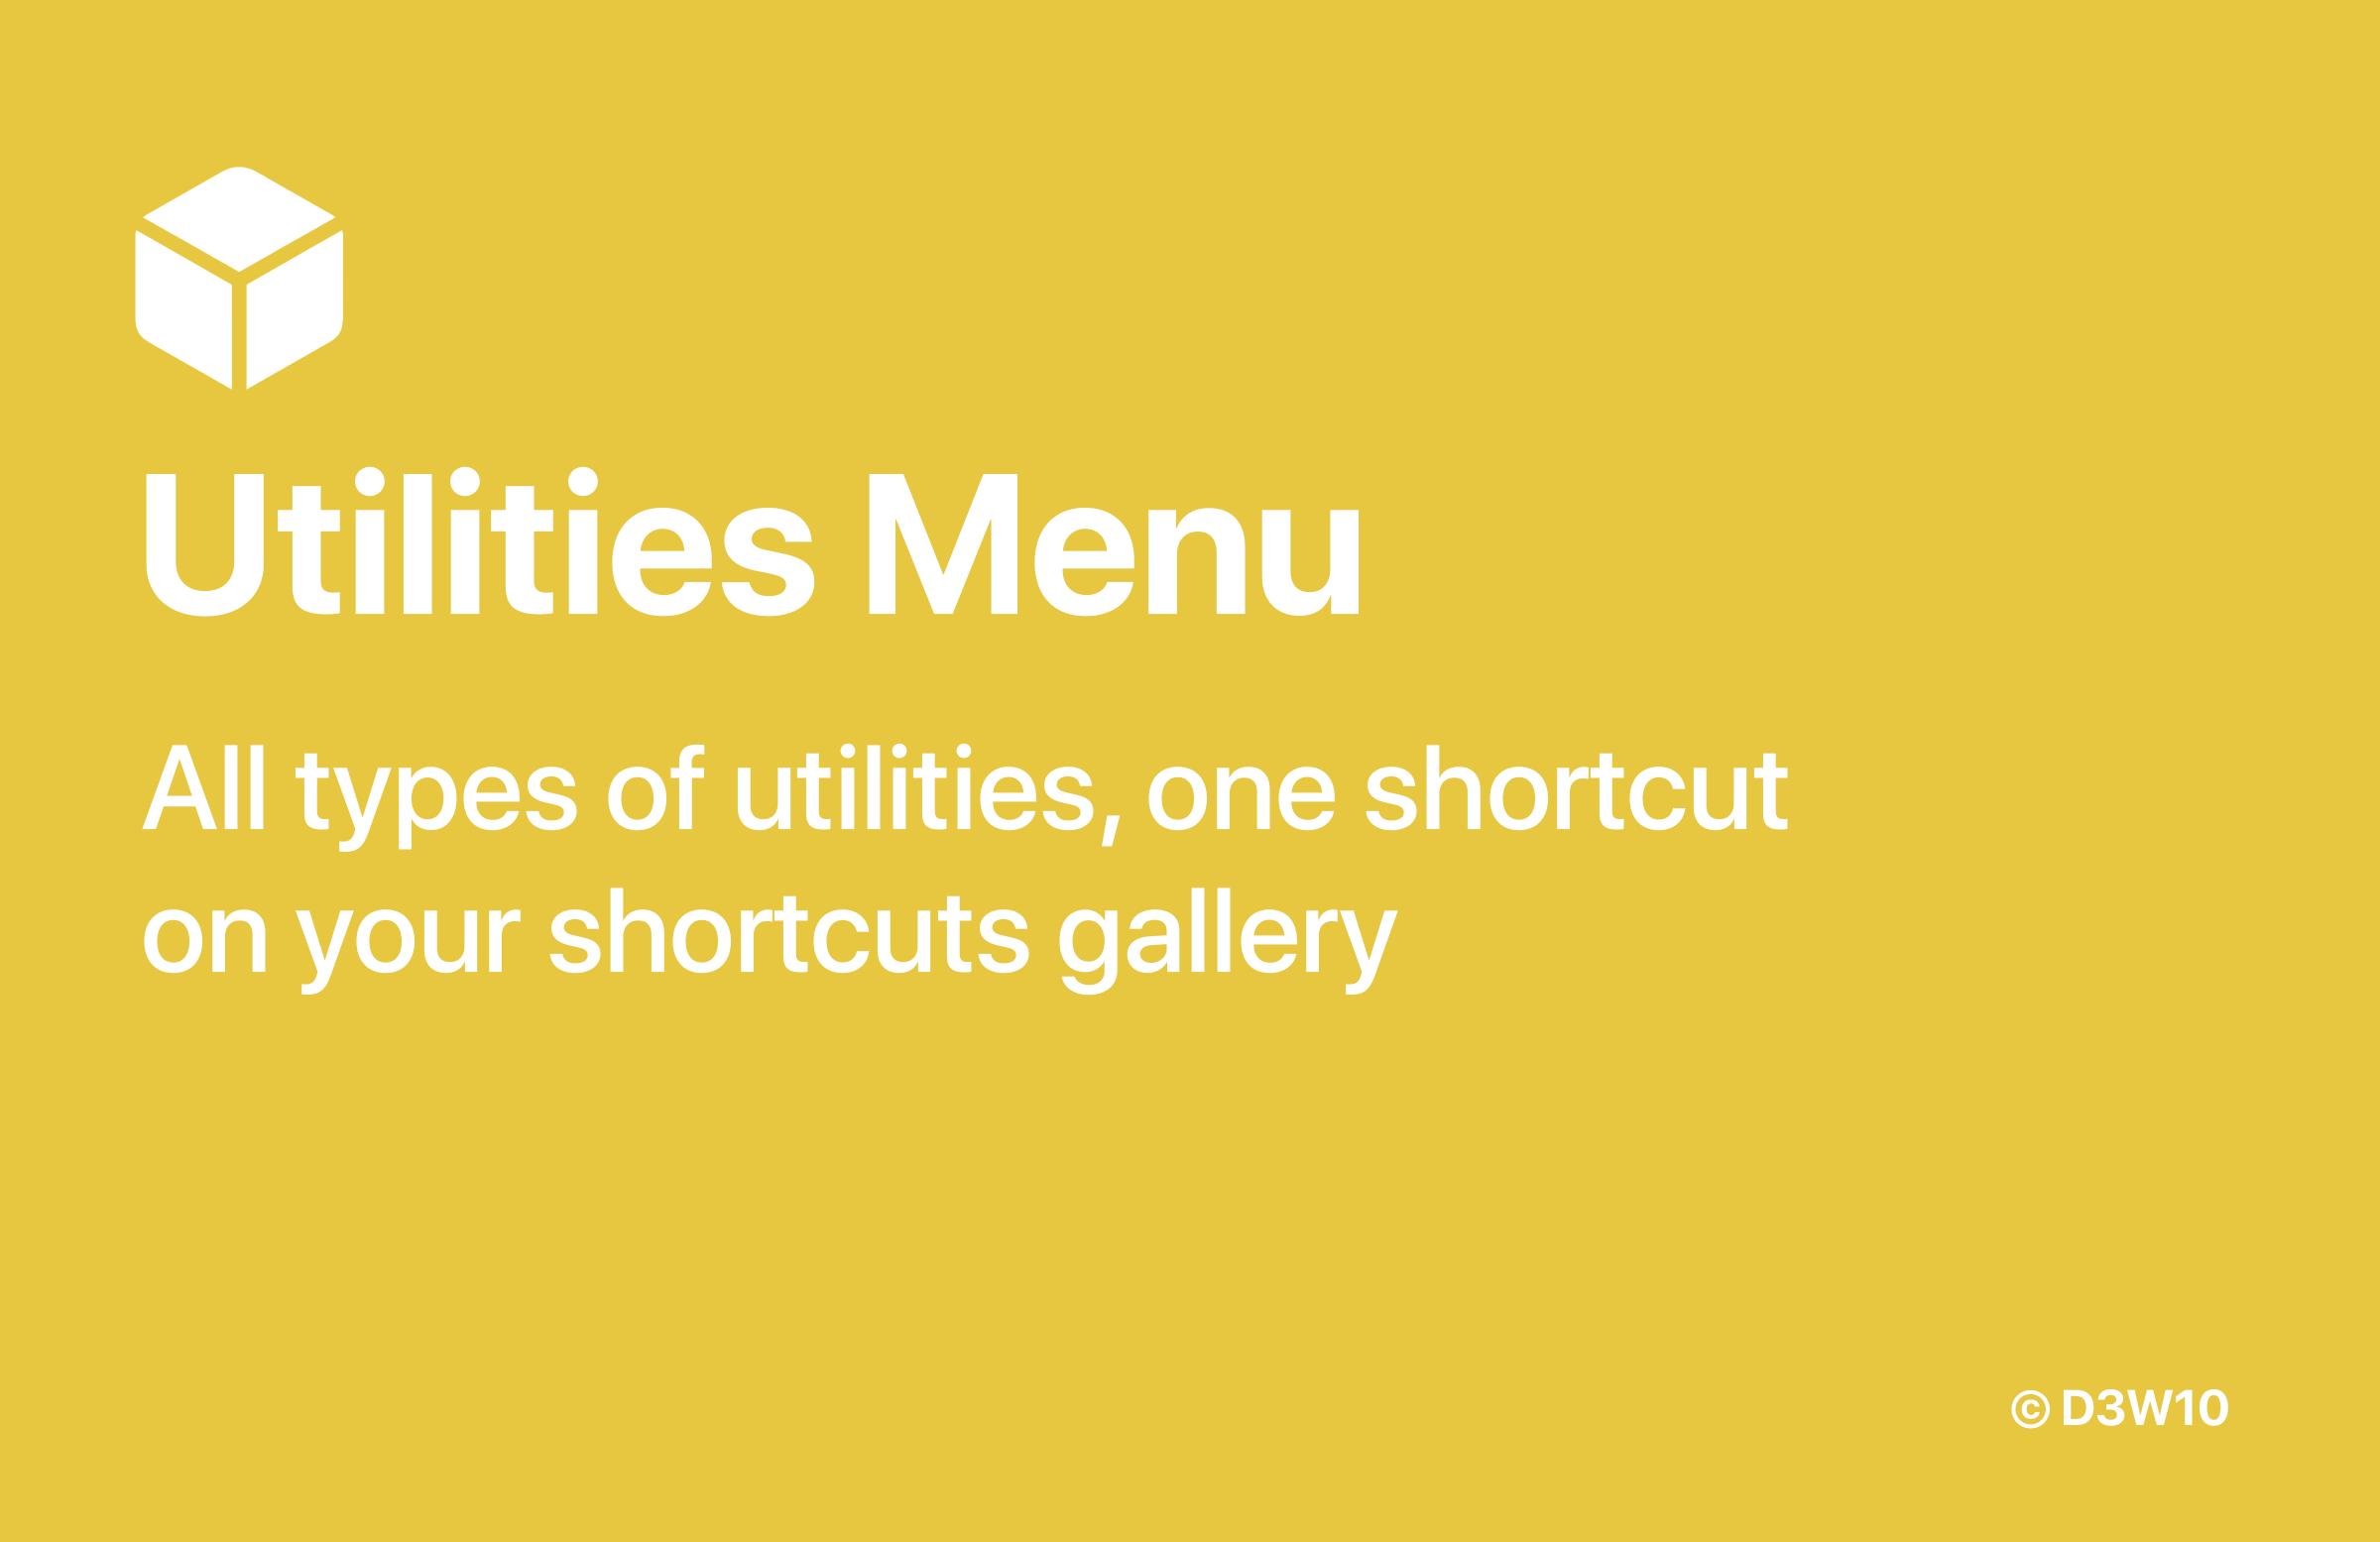 Utilities Menu Banner